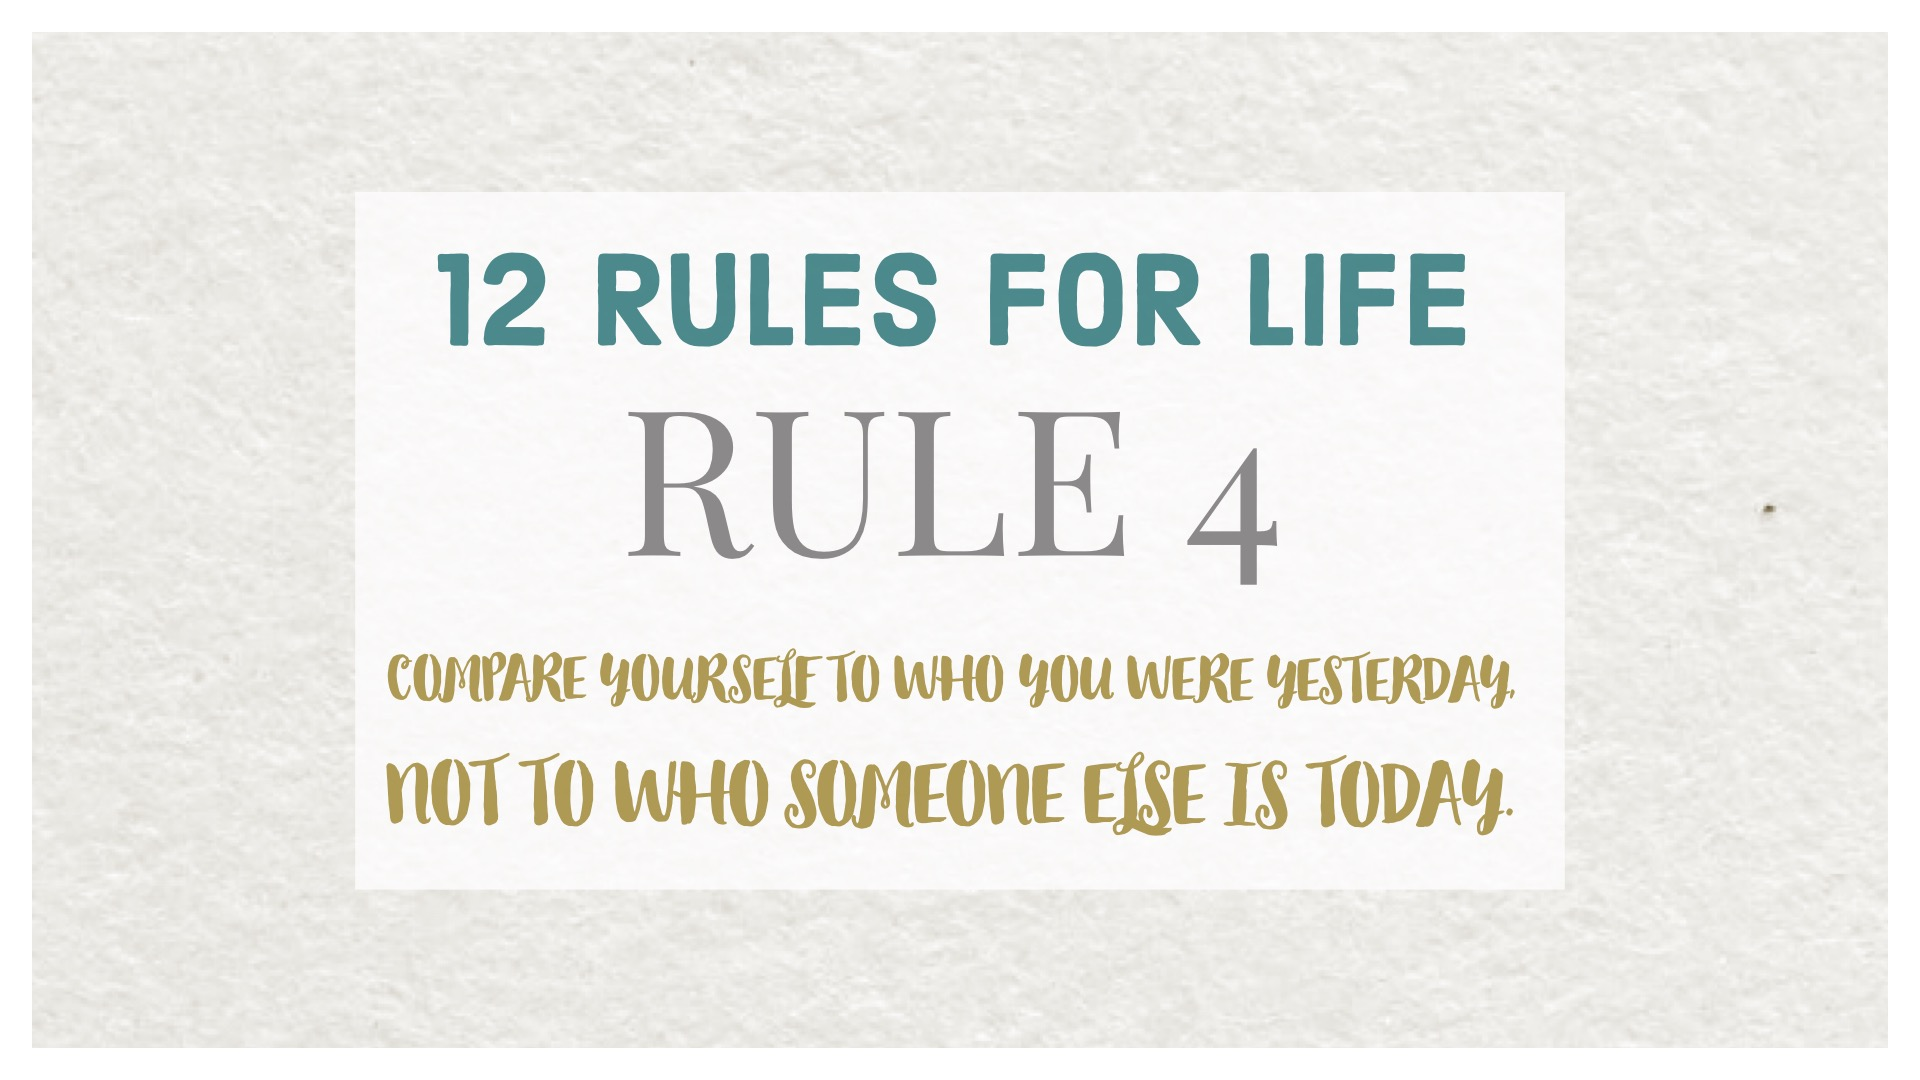 12 rules life